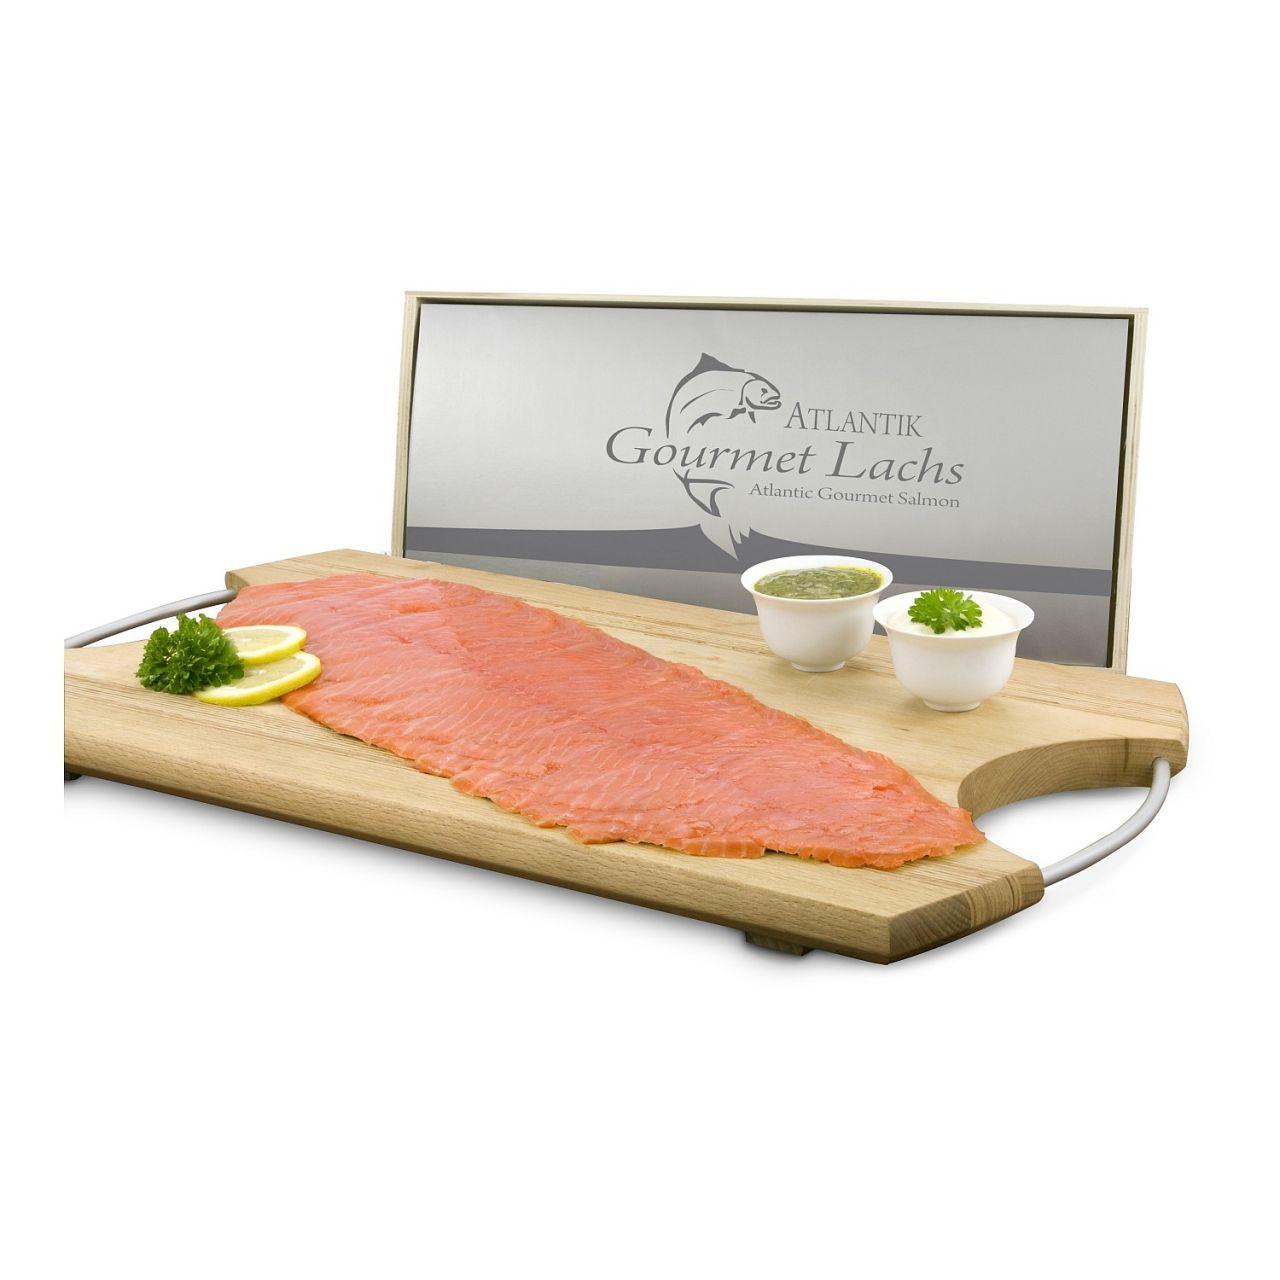 Lachs-Geschenk: Gourmet